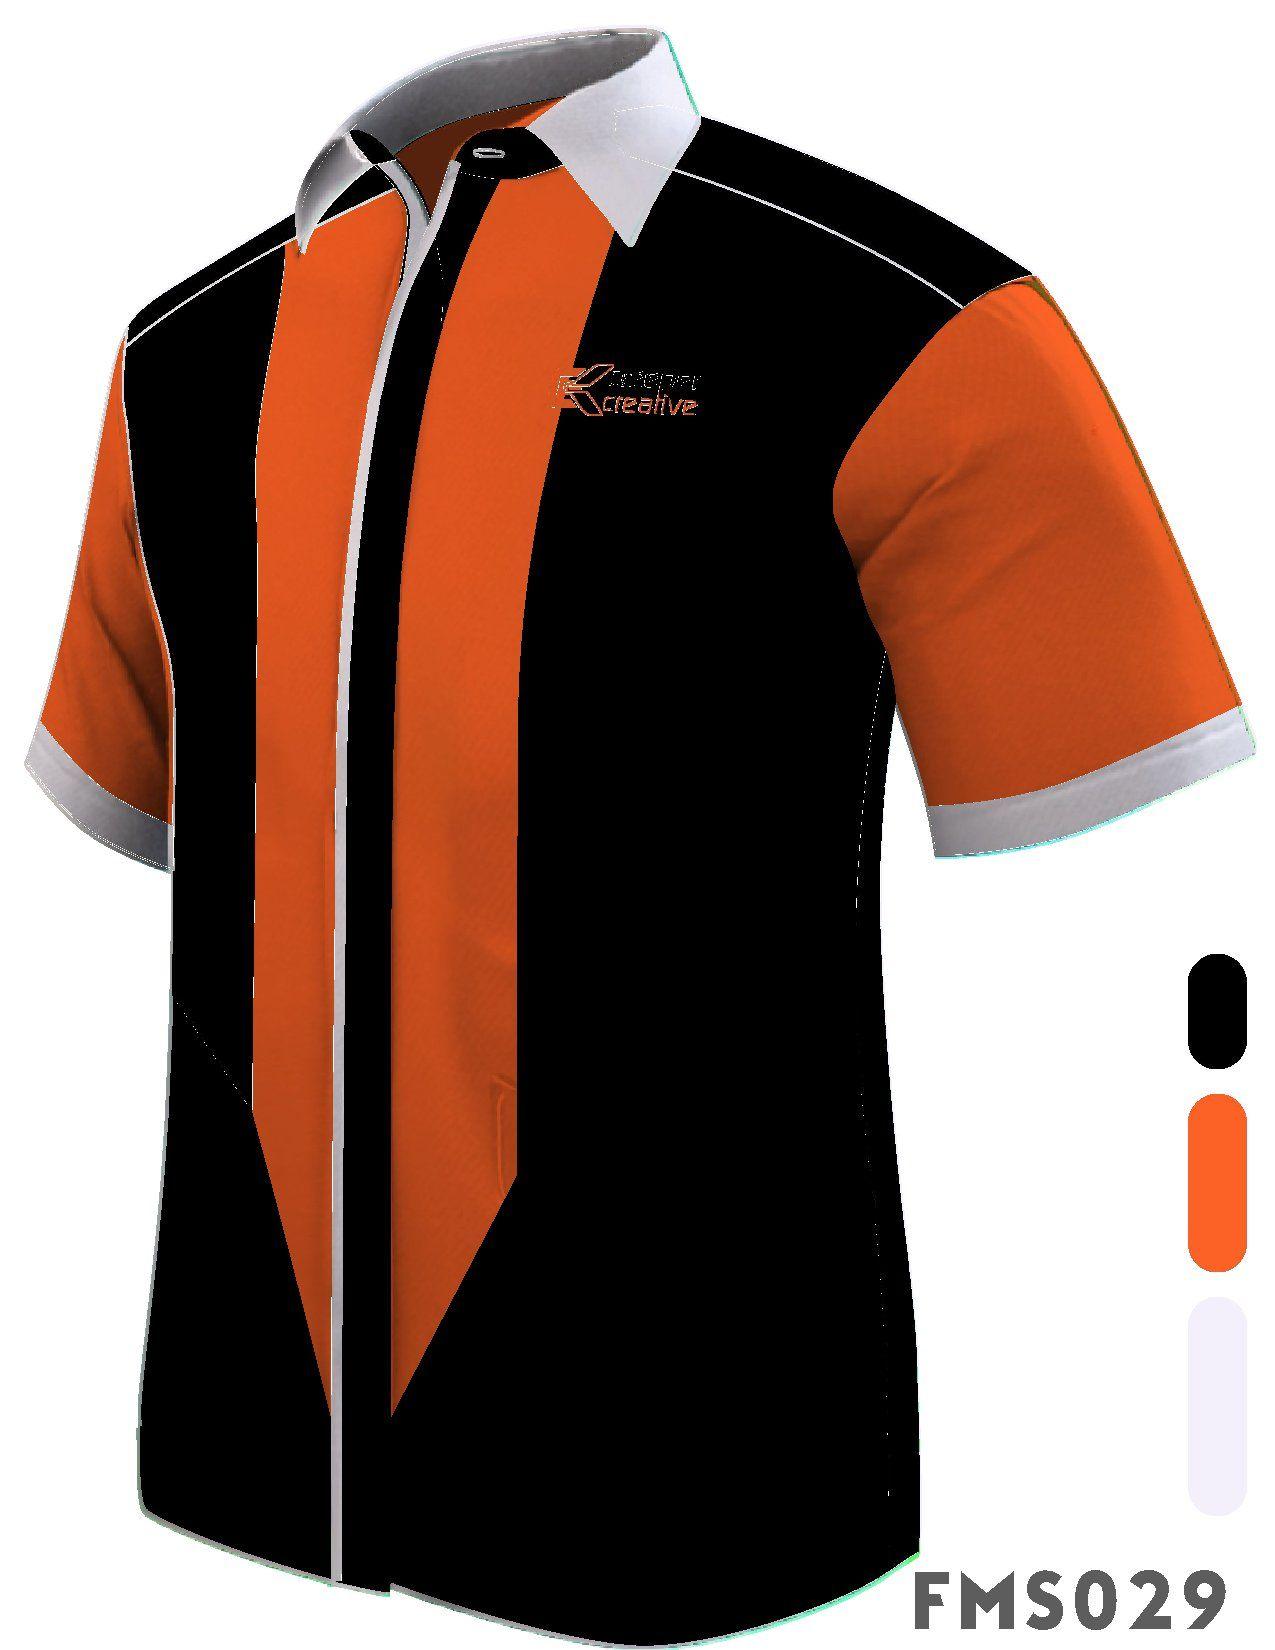 Fms029 F1 Shirts Male Shirts Short Sleeve Corporate Shirts